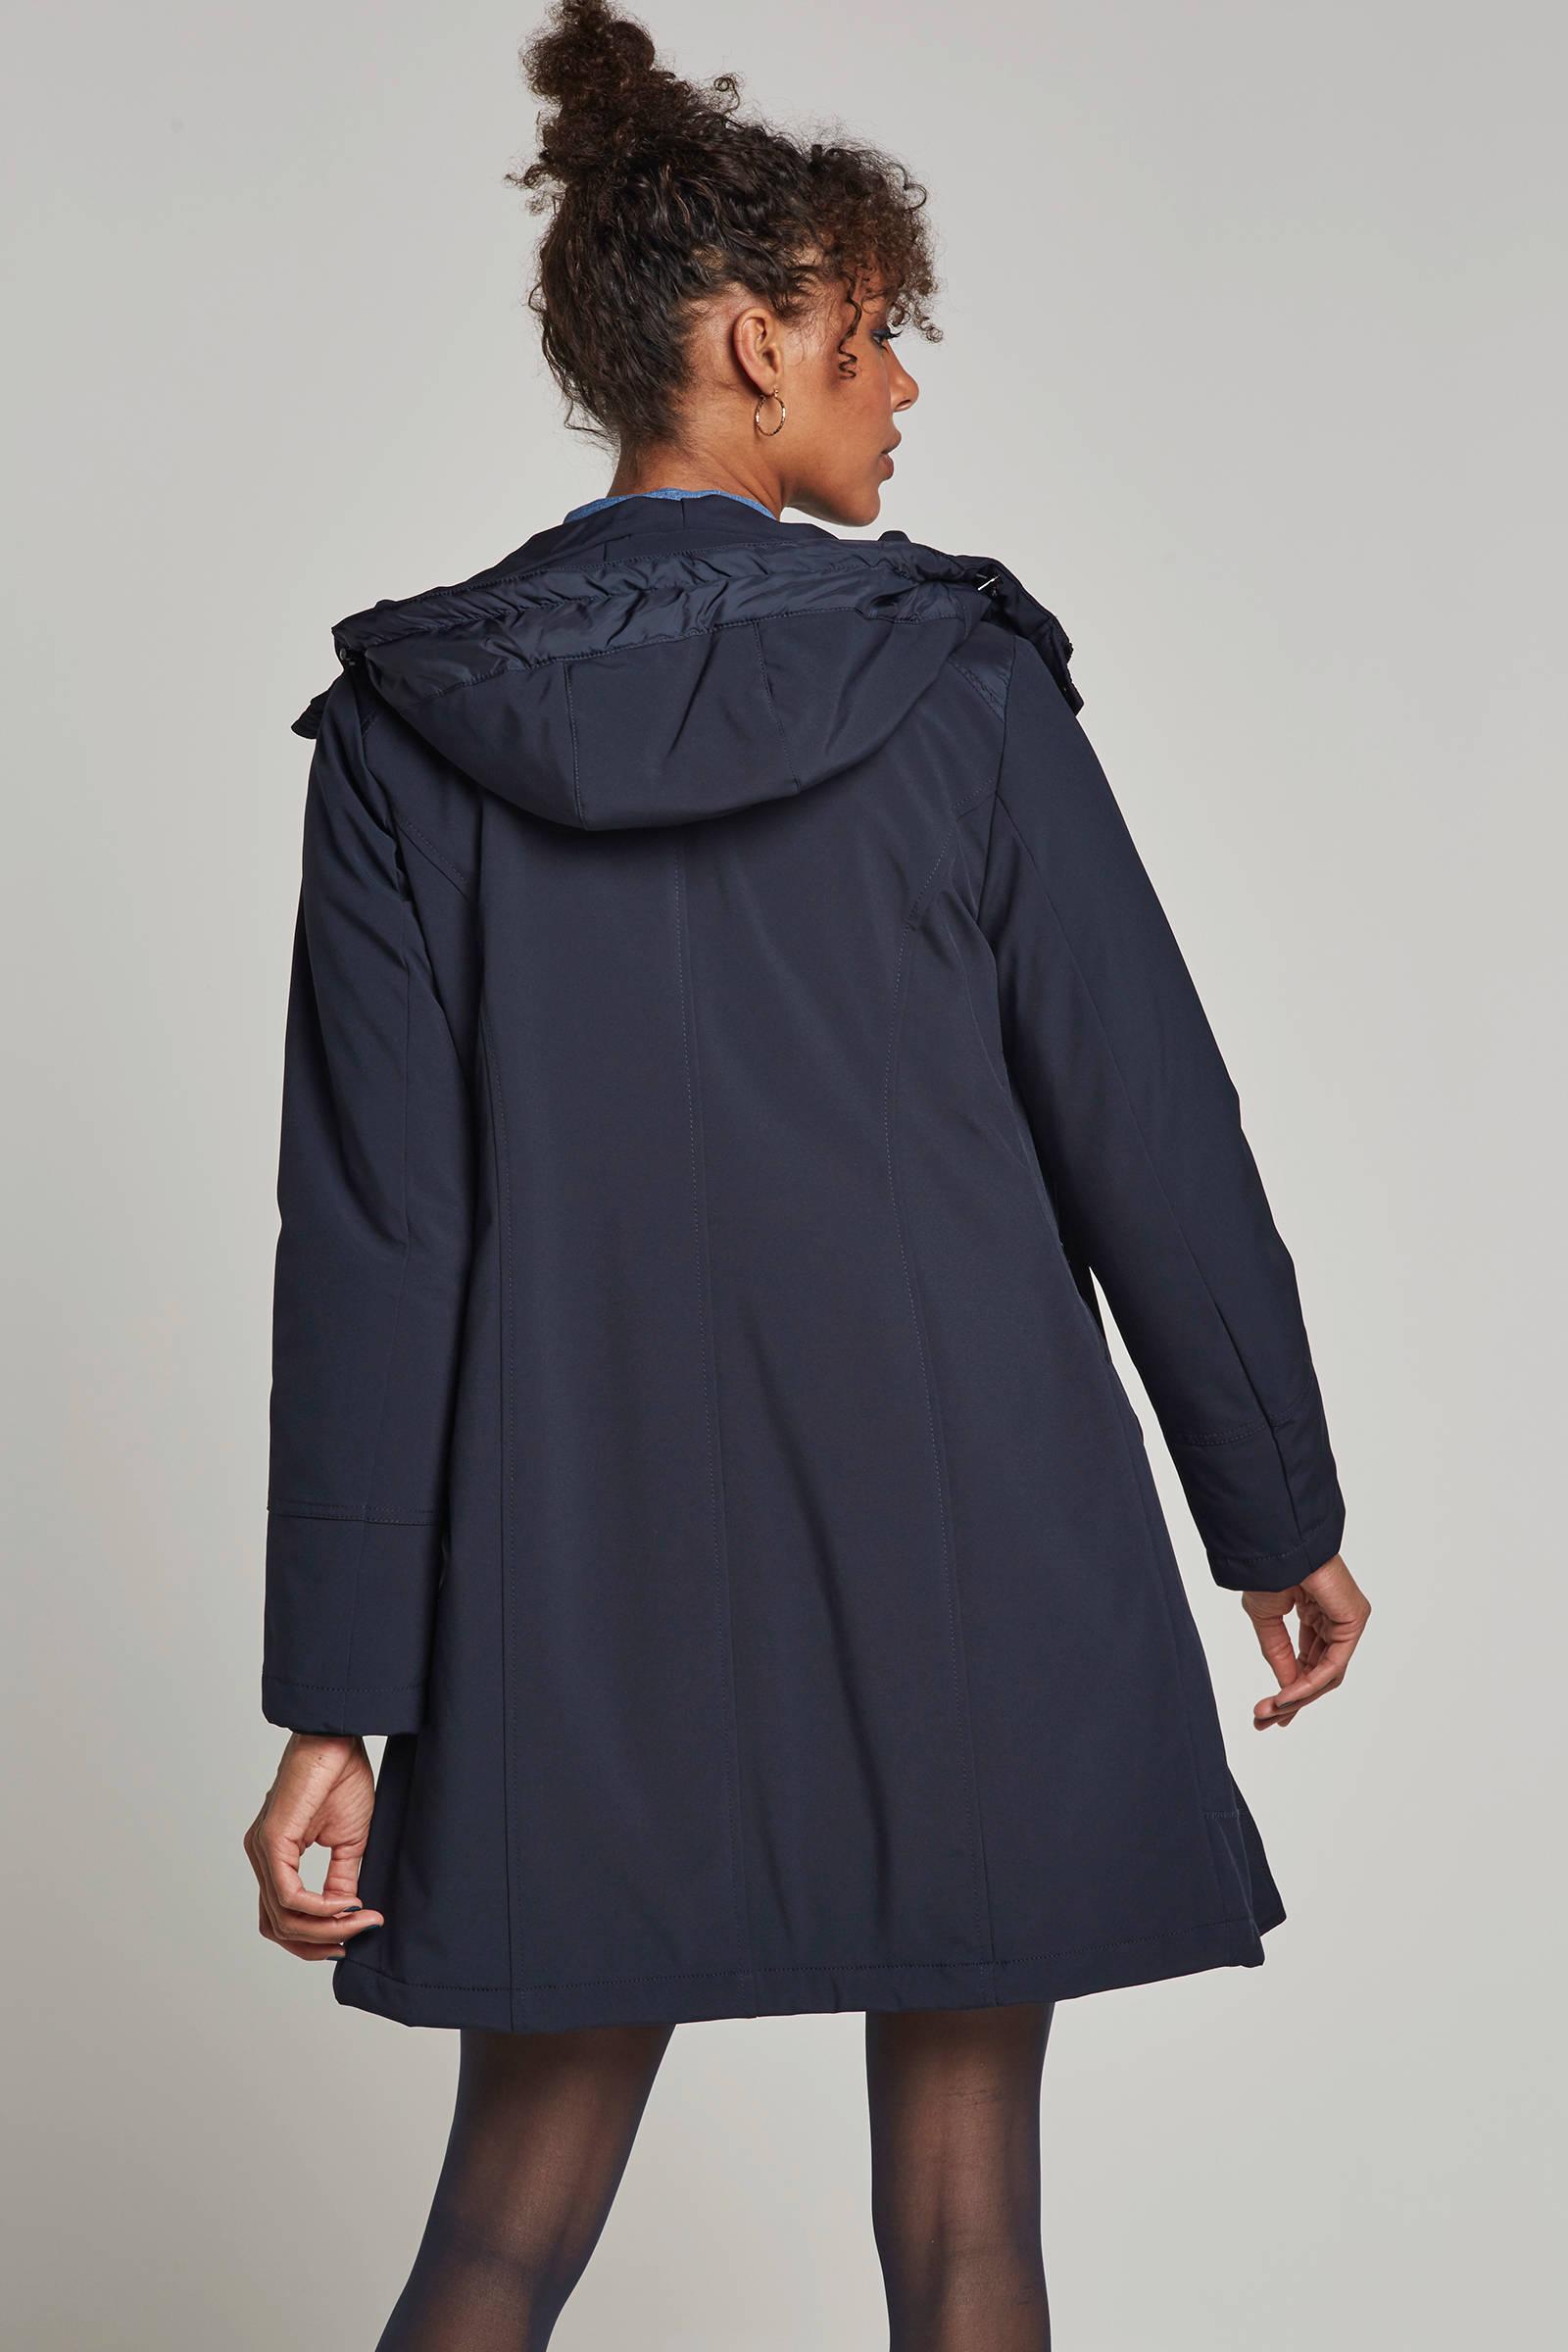 Miss Etam Regulier softshell winterjas marine | wehkamp